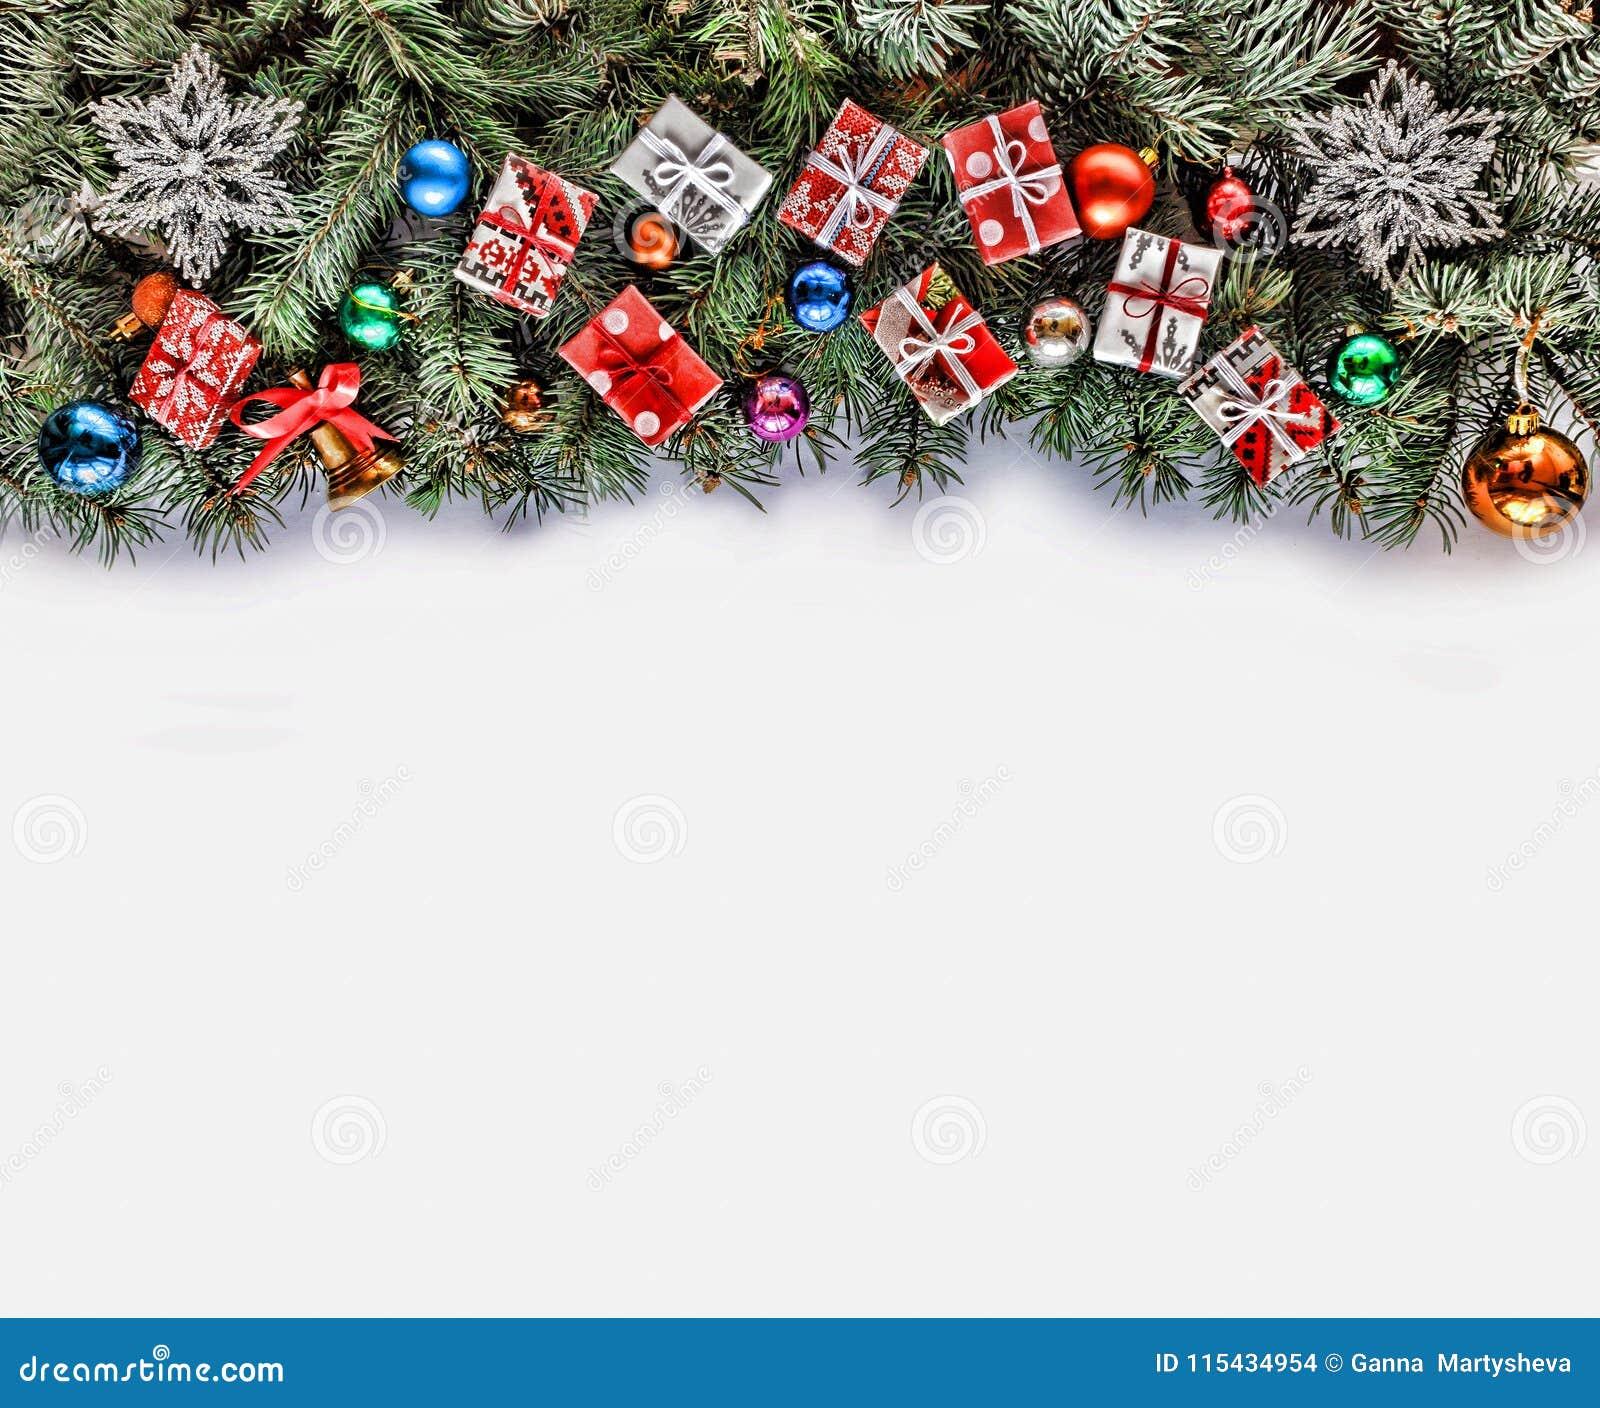 Christmas 2019 Frame 2019, Christmas Frame, Christmas Branches, Christmas Decor, Bran